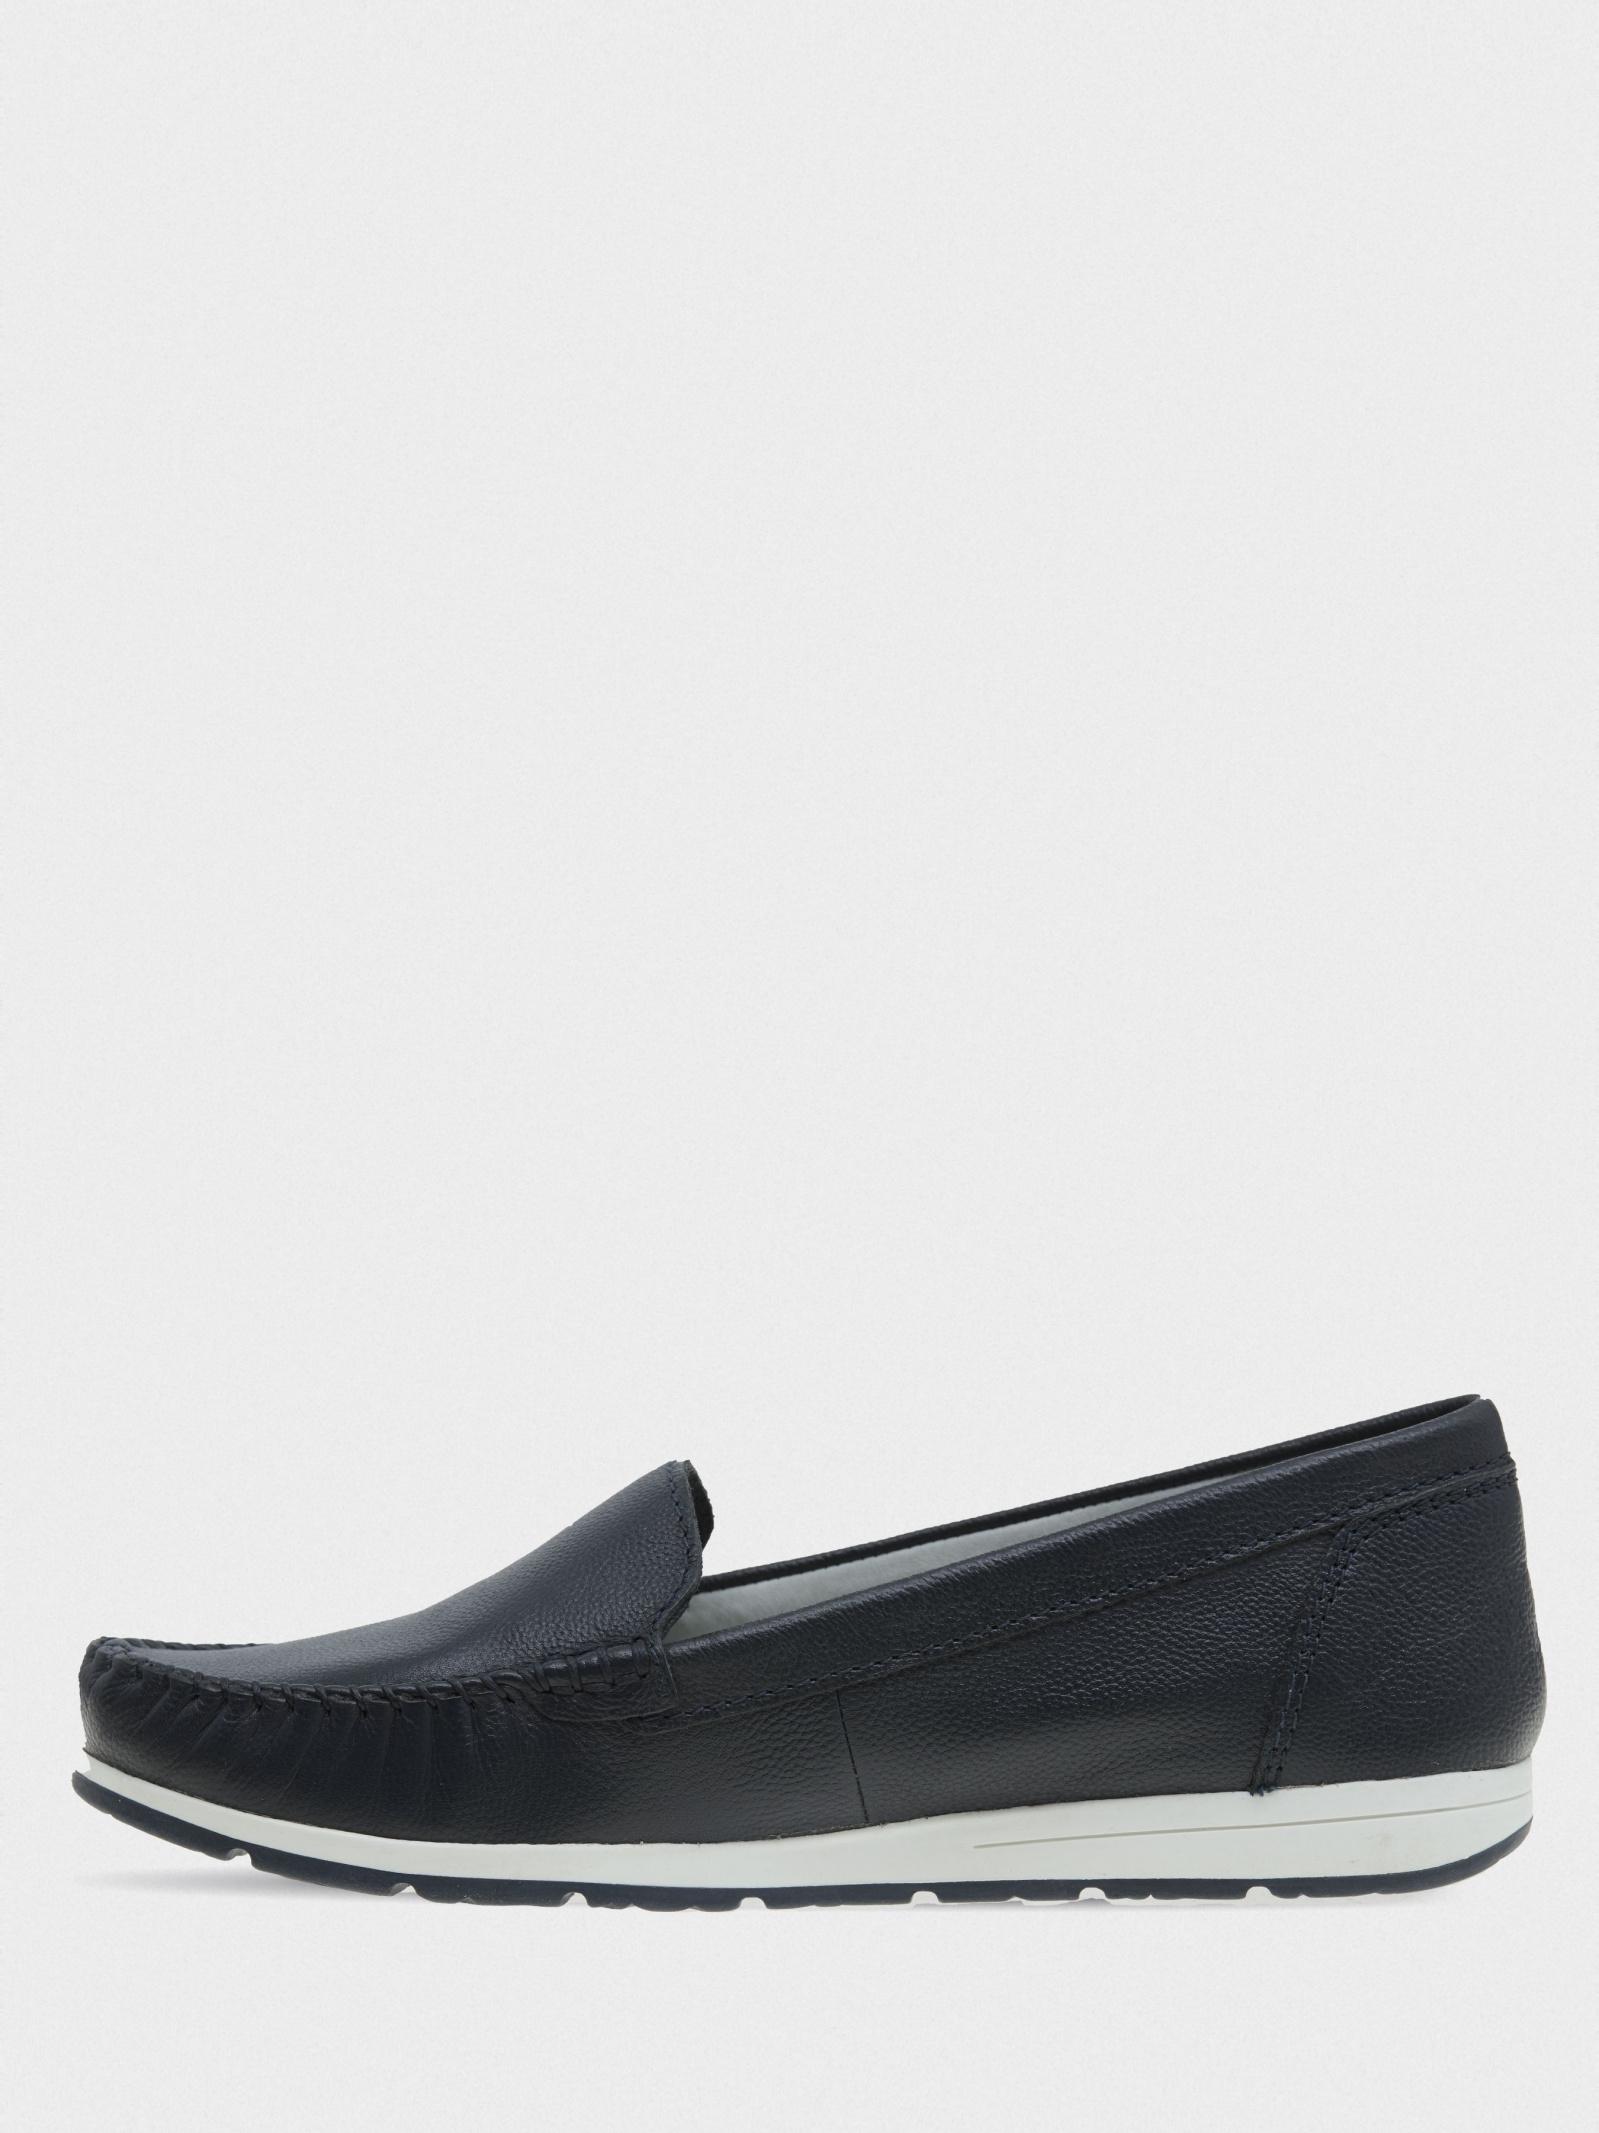 Мокасины женские Marco Tozzi 3H322 размеры обуви, 2017